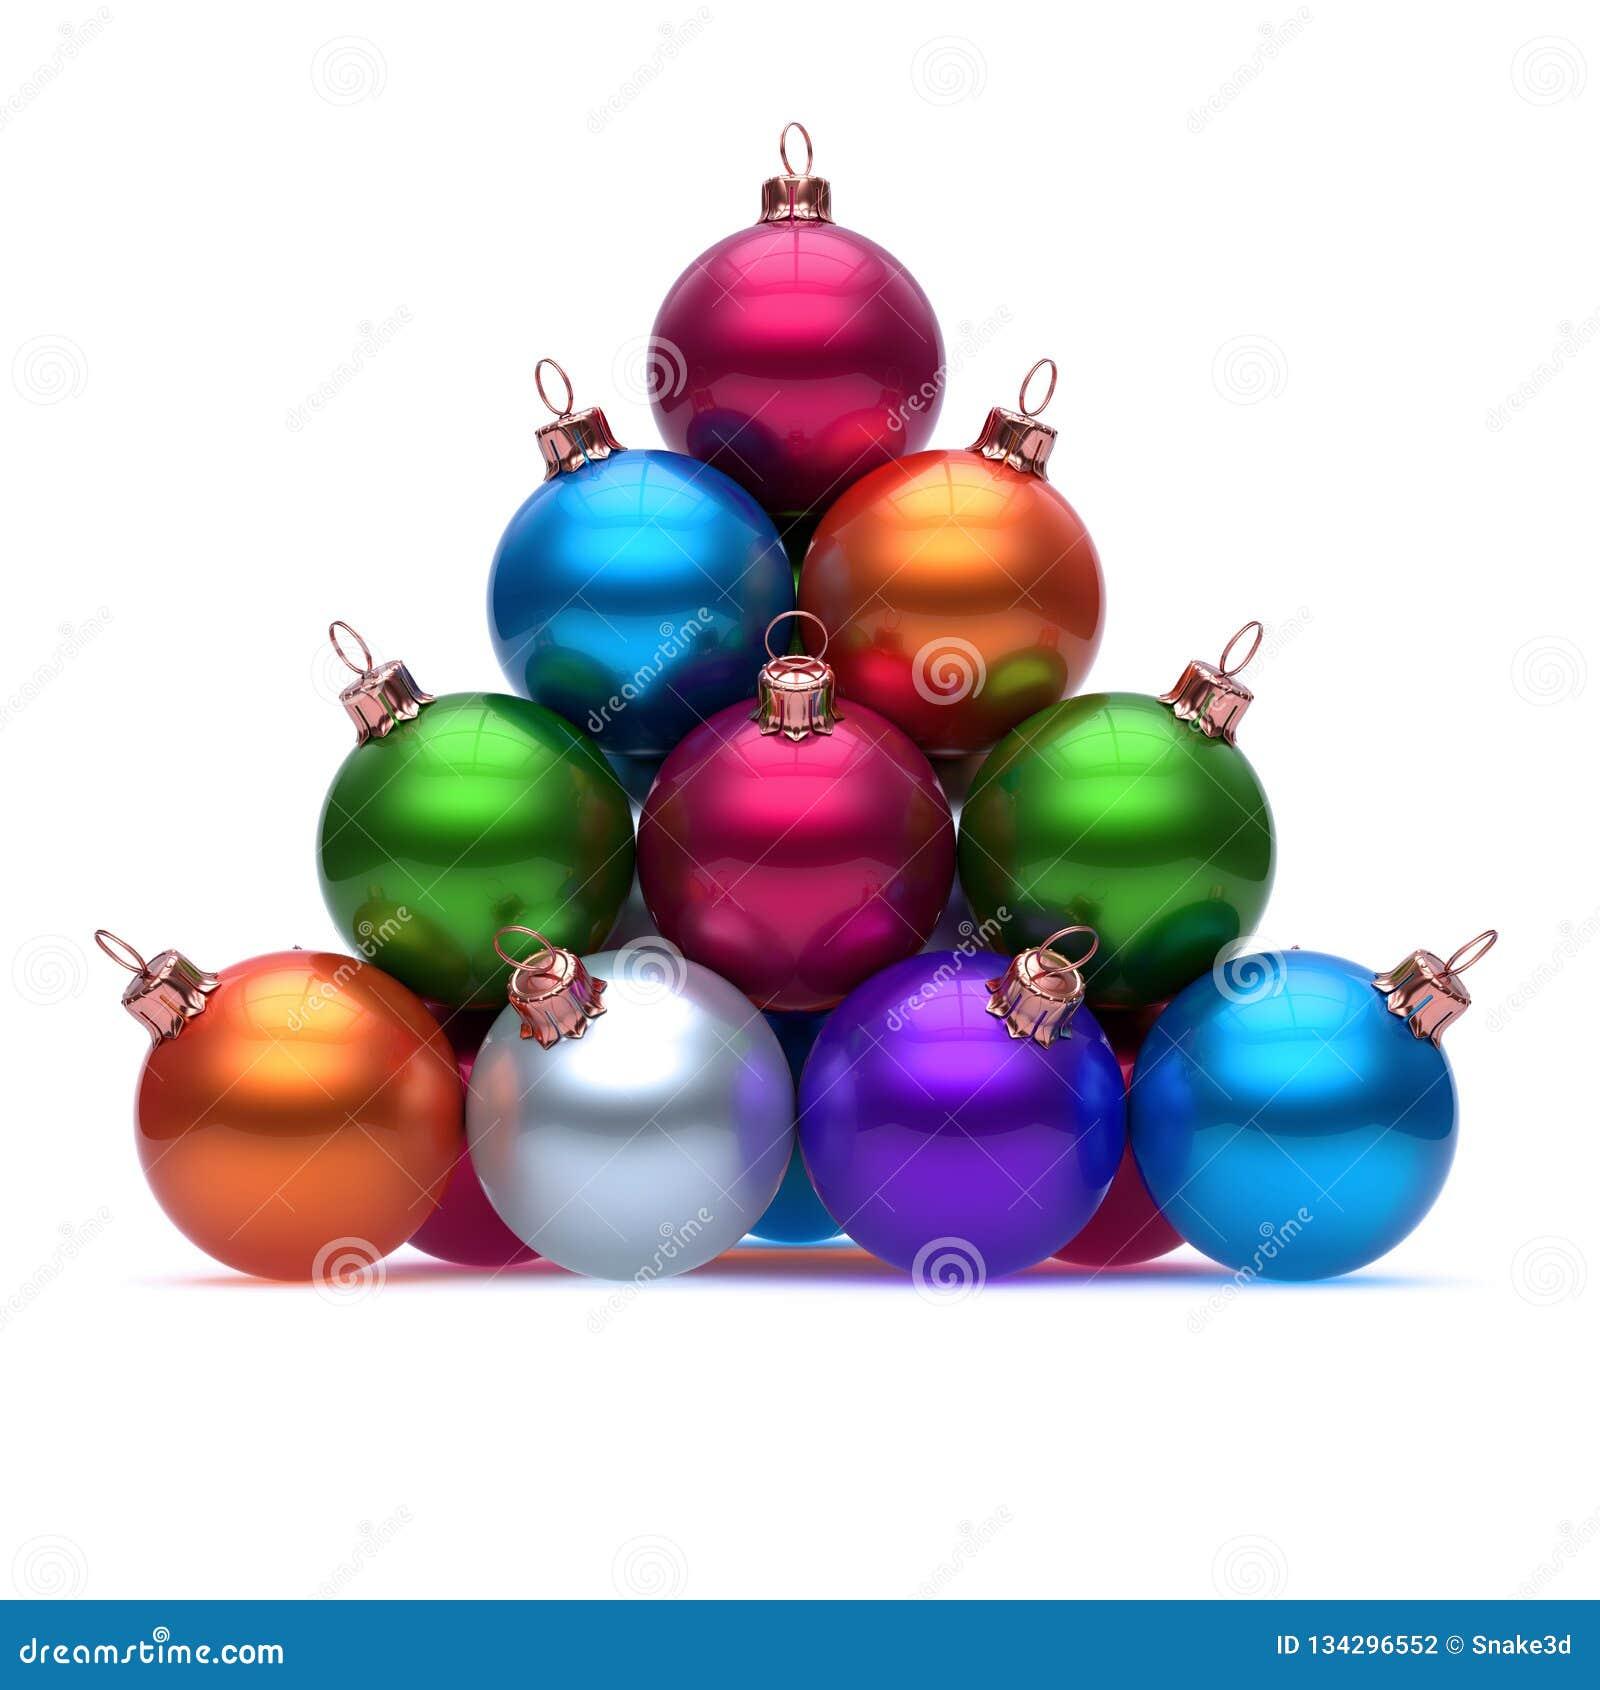 Pyramid of Christmas balls colorful red blue orange purple green